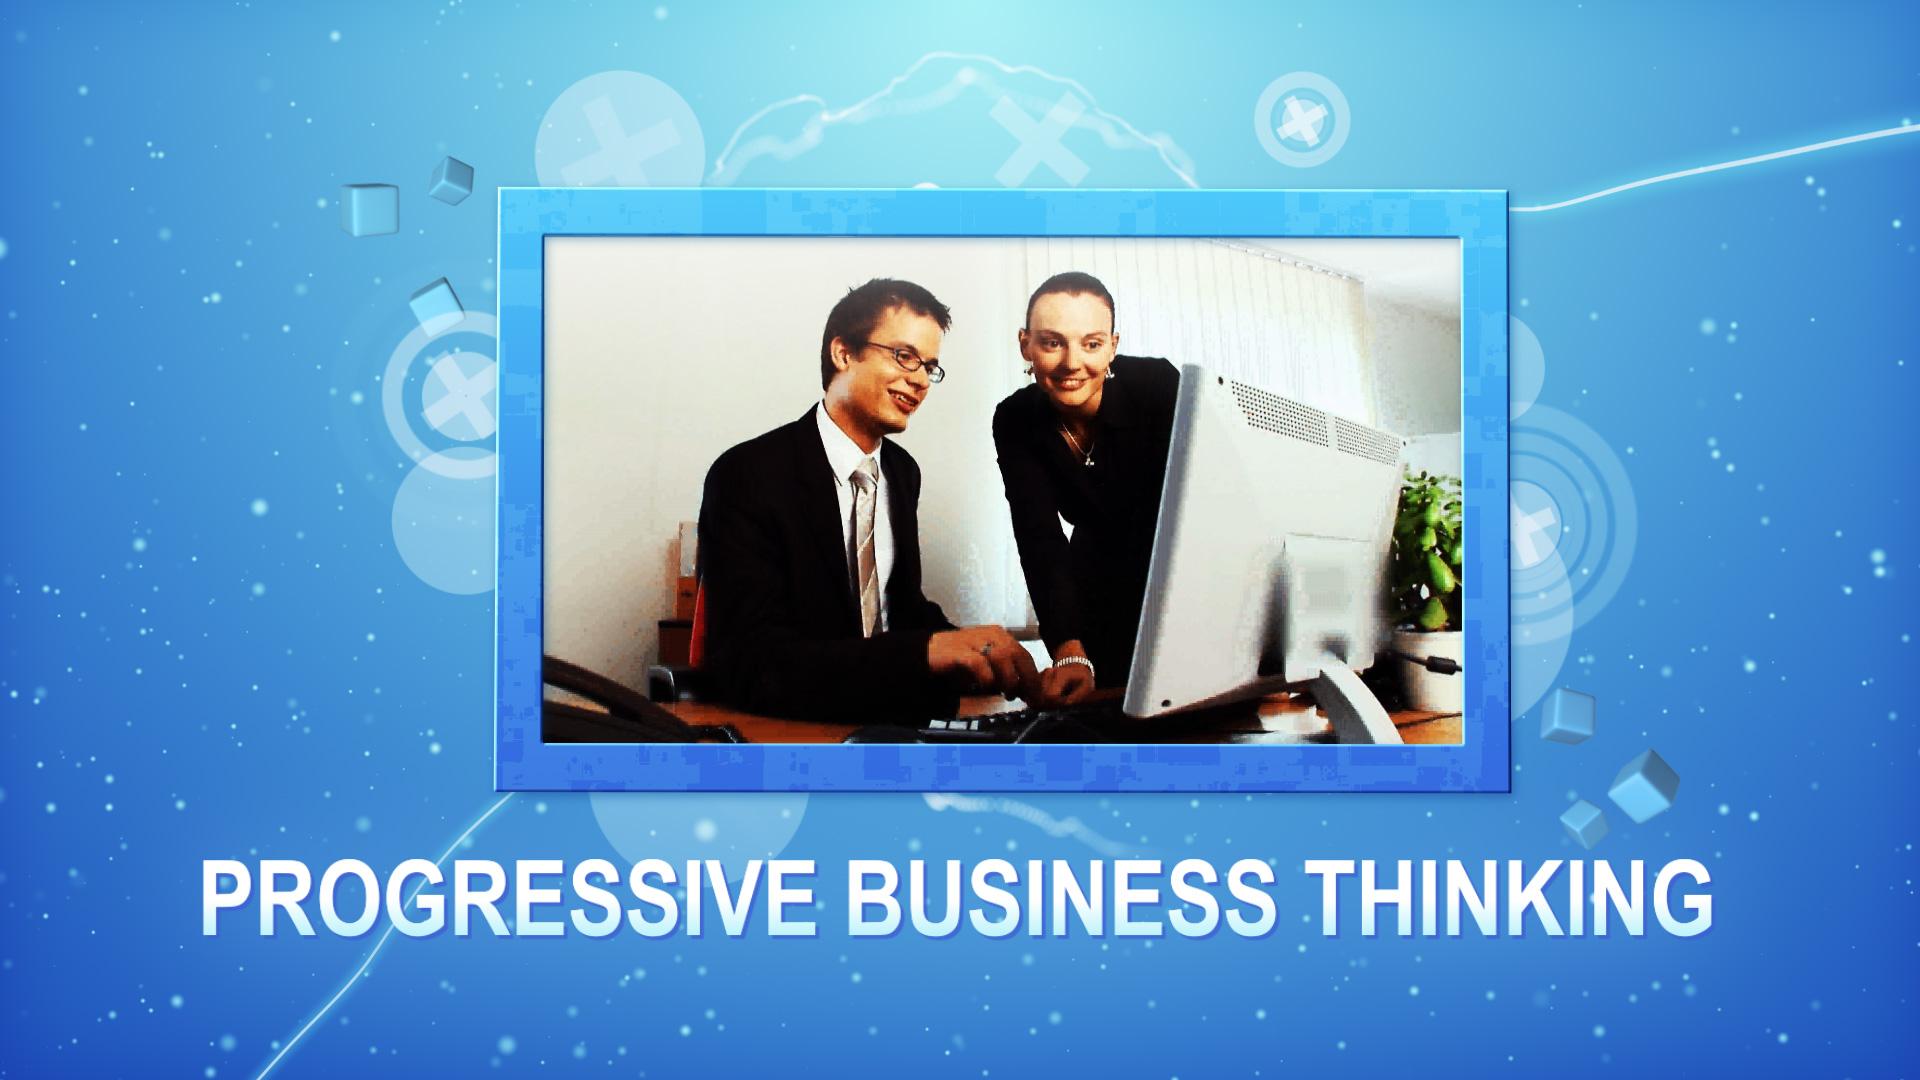 Заставка After Effects на тему бізнес та послуги №26813